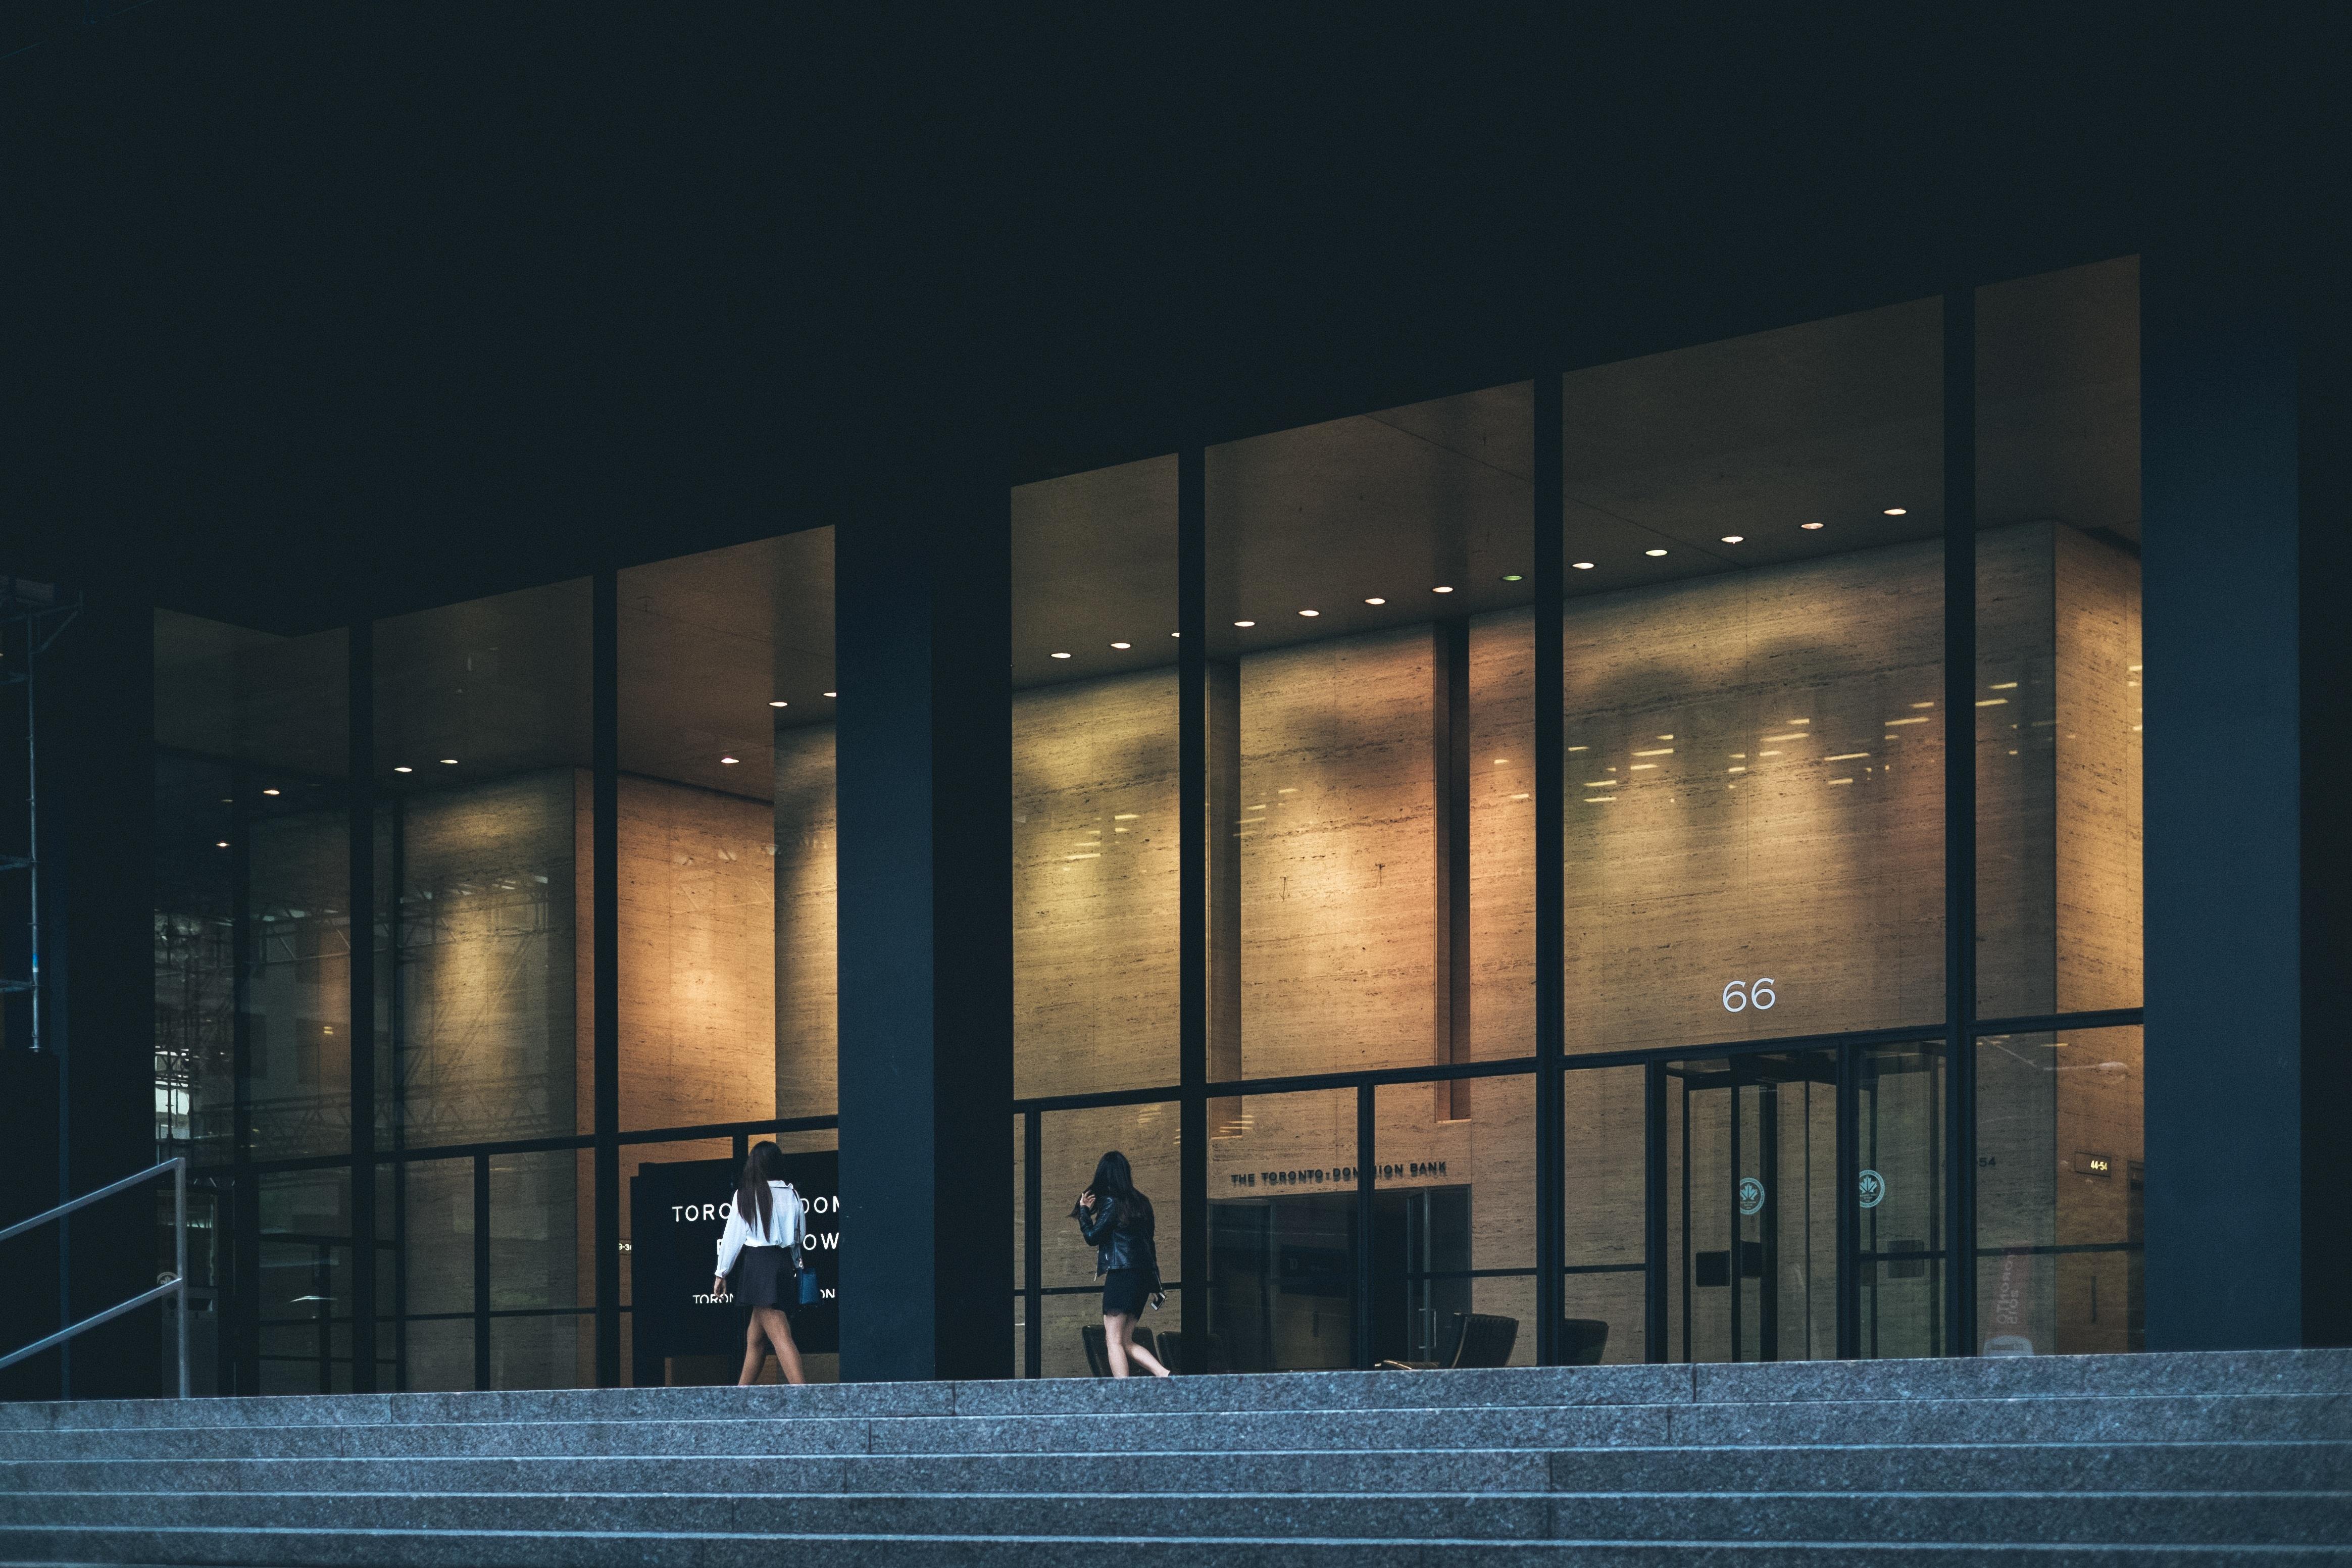 Gambar Kerja Cahaya Arsitektur Malam Bangunan Kota Refleksi